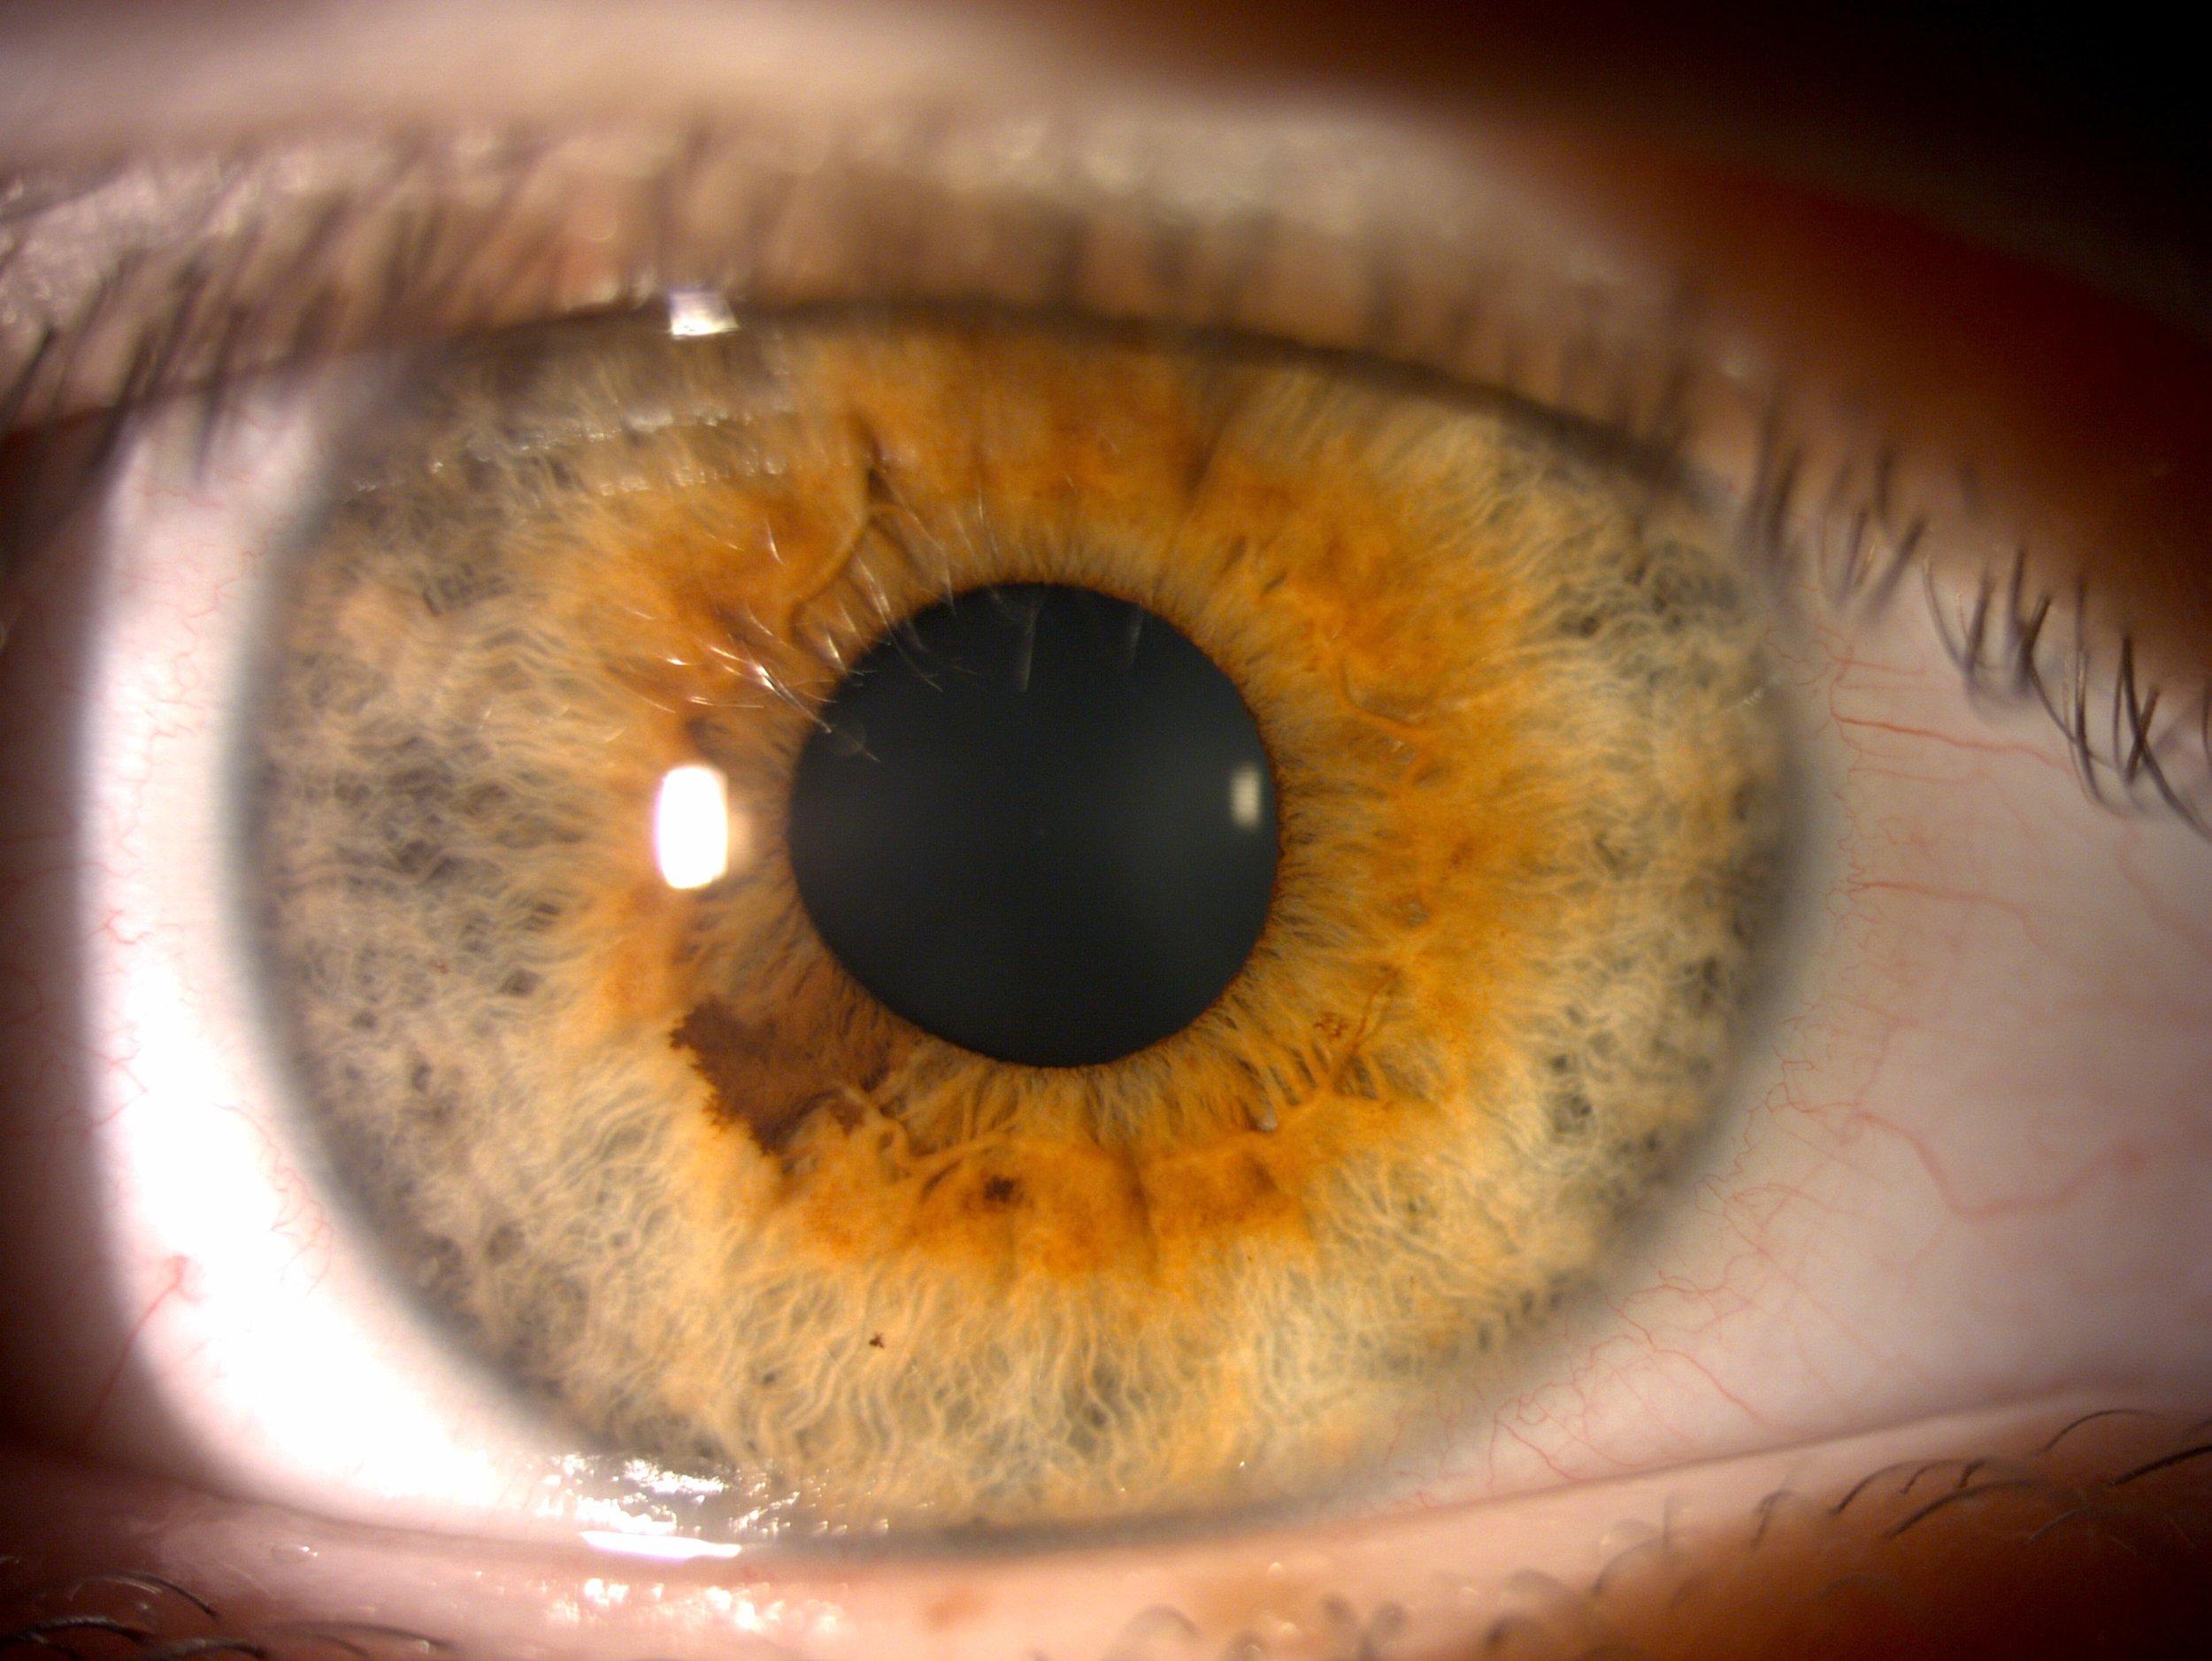 Iris photo taken by Dr. Jillian Wong, optometrist @ OPT clinic